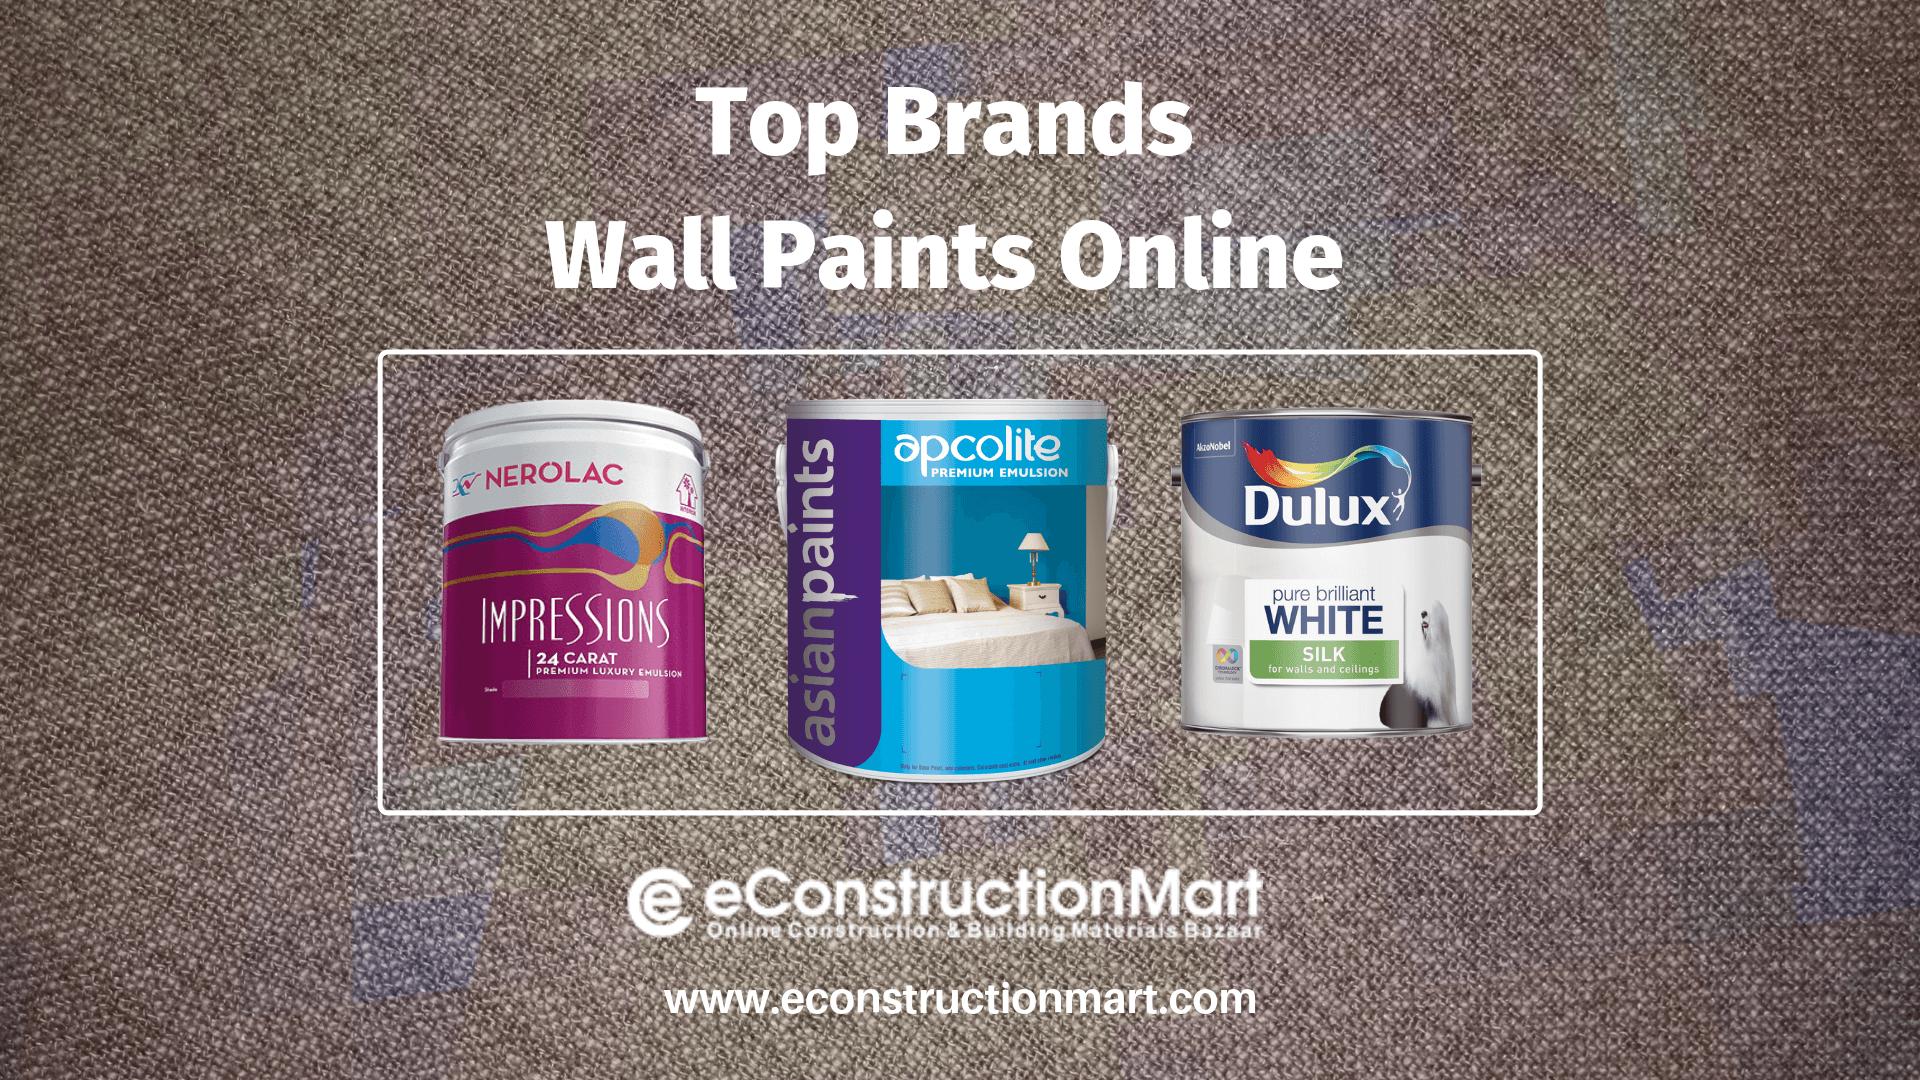 Top Brands Wall Paints Online Paint Prices Asian Paints Online Painting